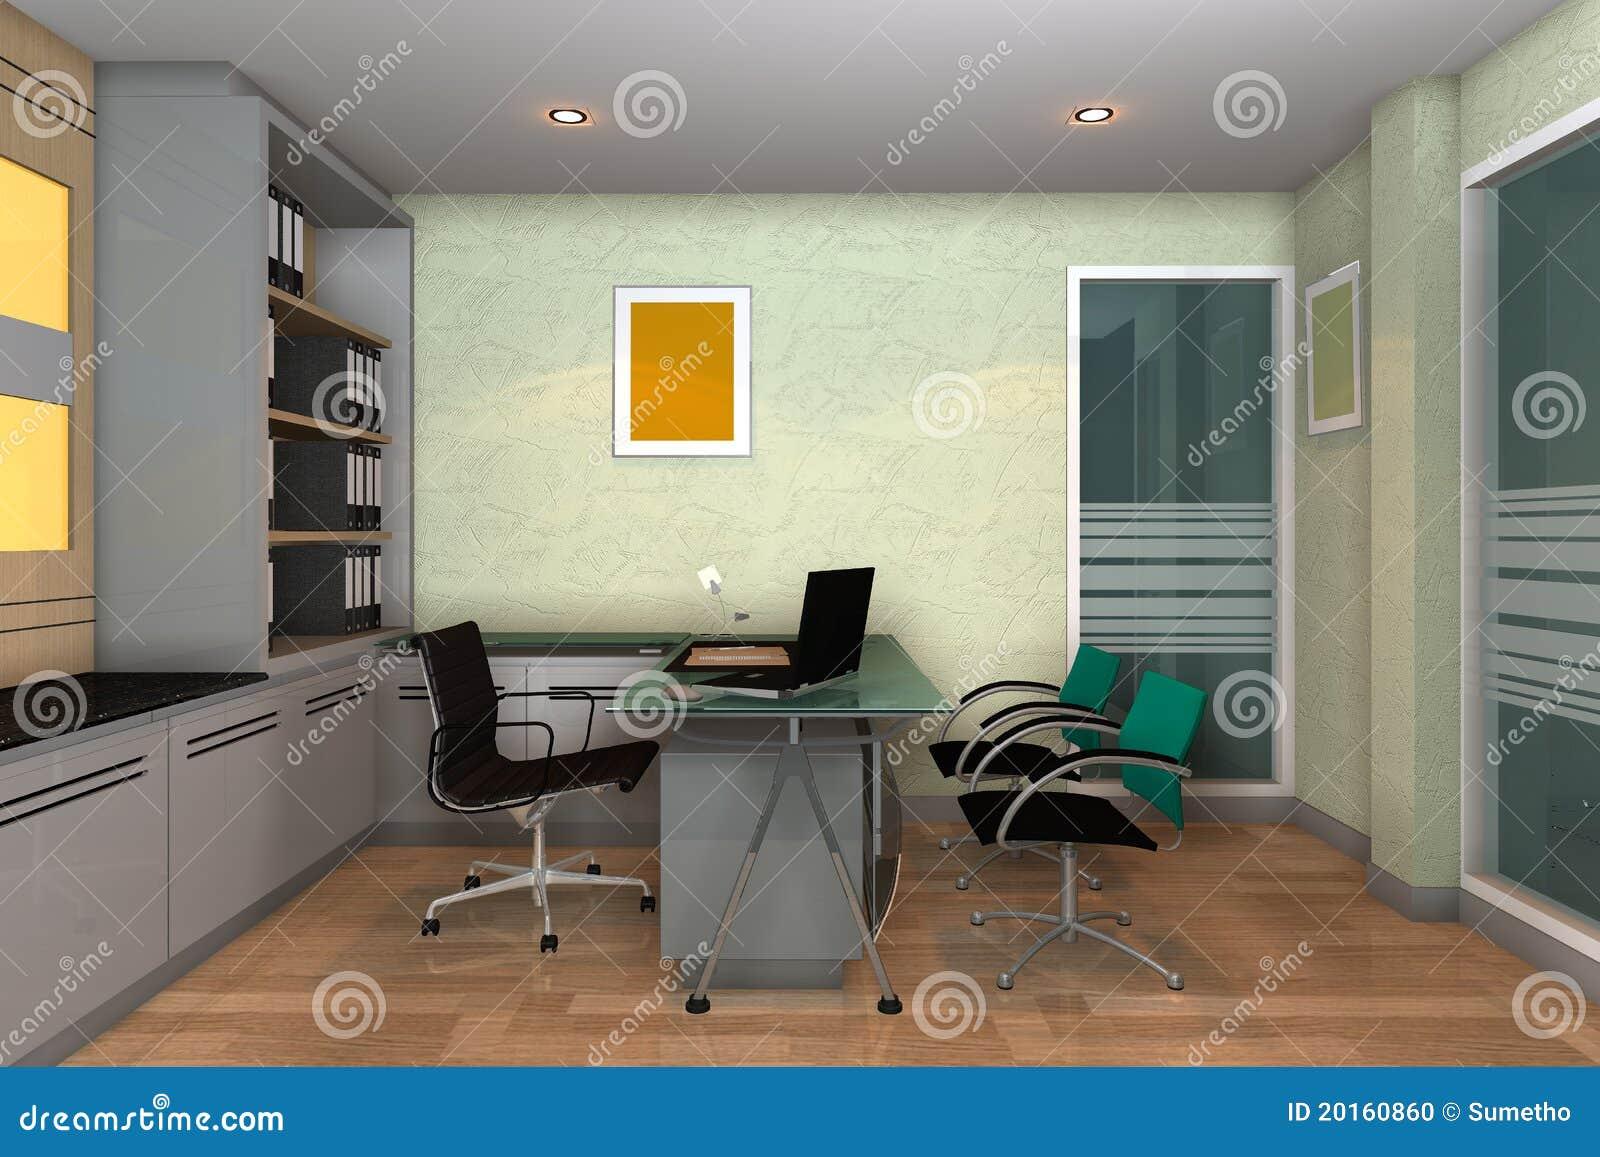 Moderner Innenraum 3d Der Buroraume Stock Abbildung Illustration